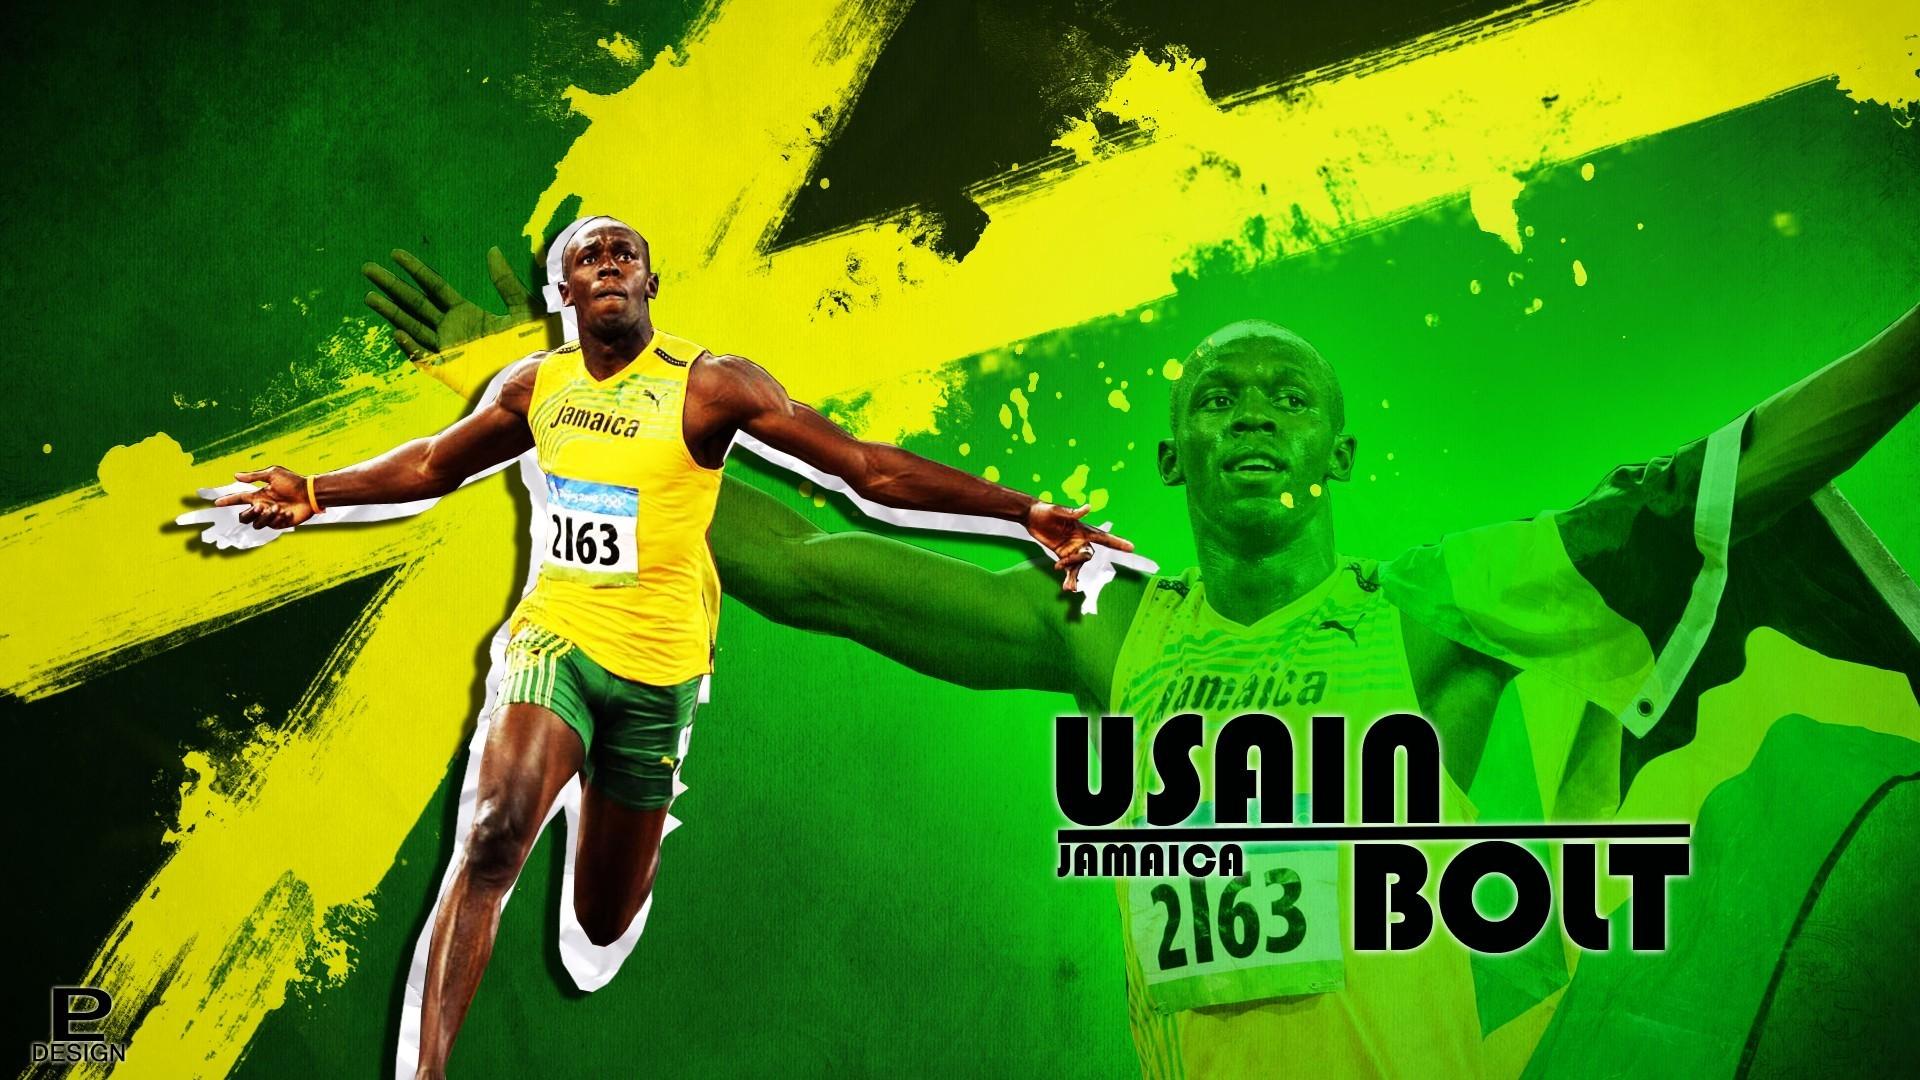 Sports Green Running Poster Usain Bolt Player 1920x1080 Px Football Human Action